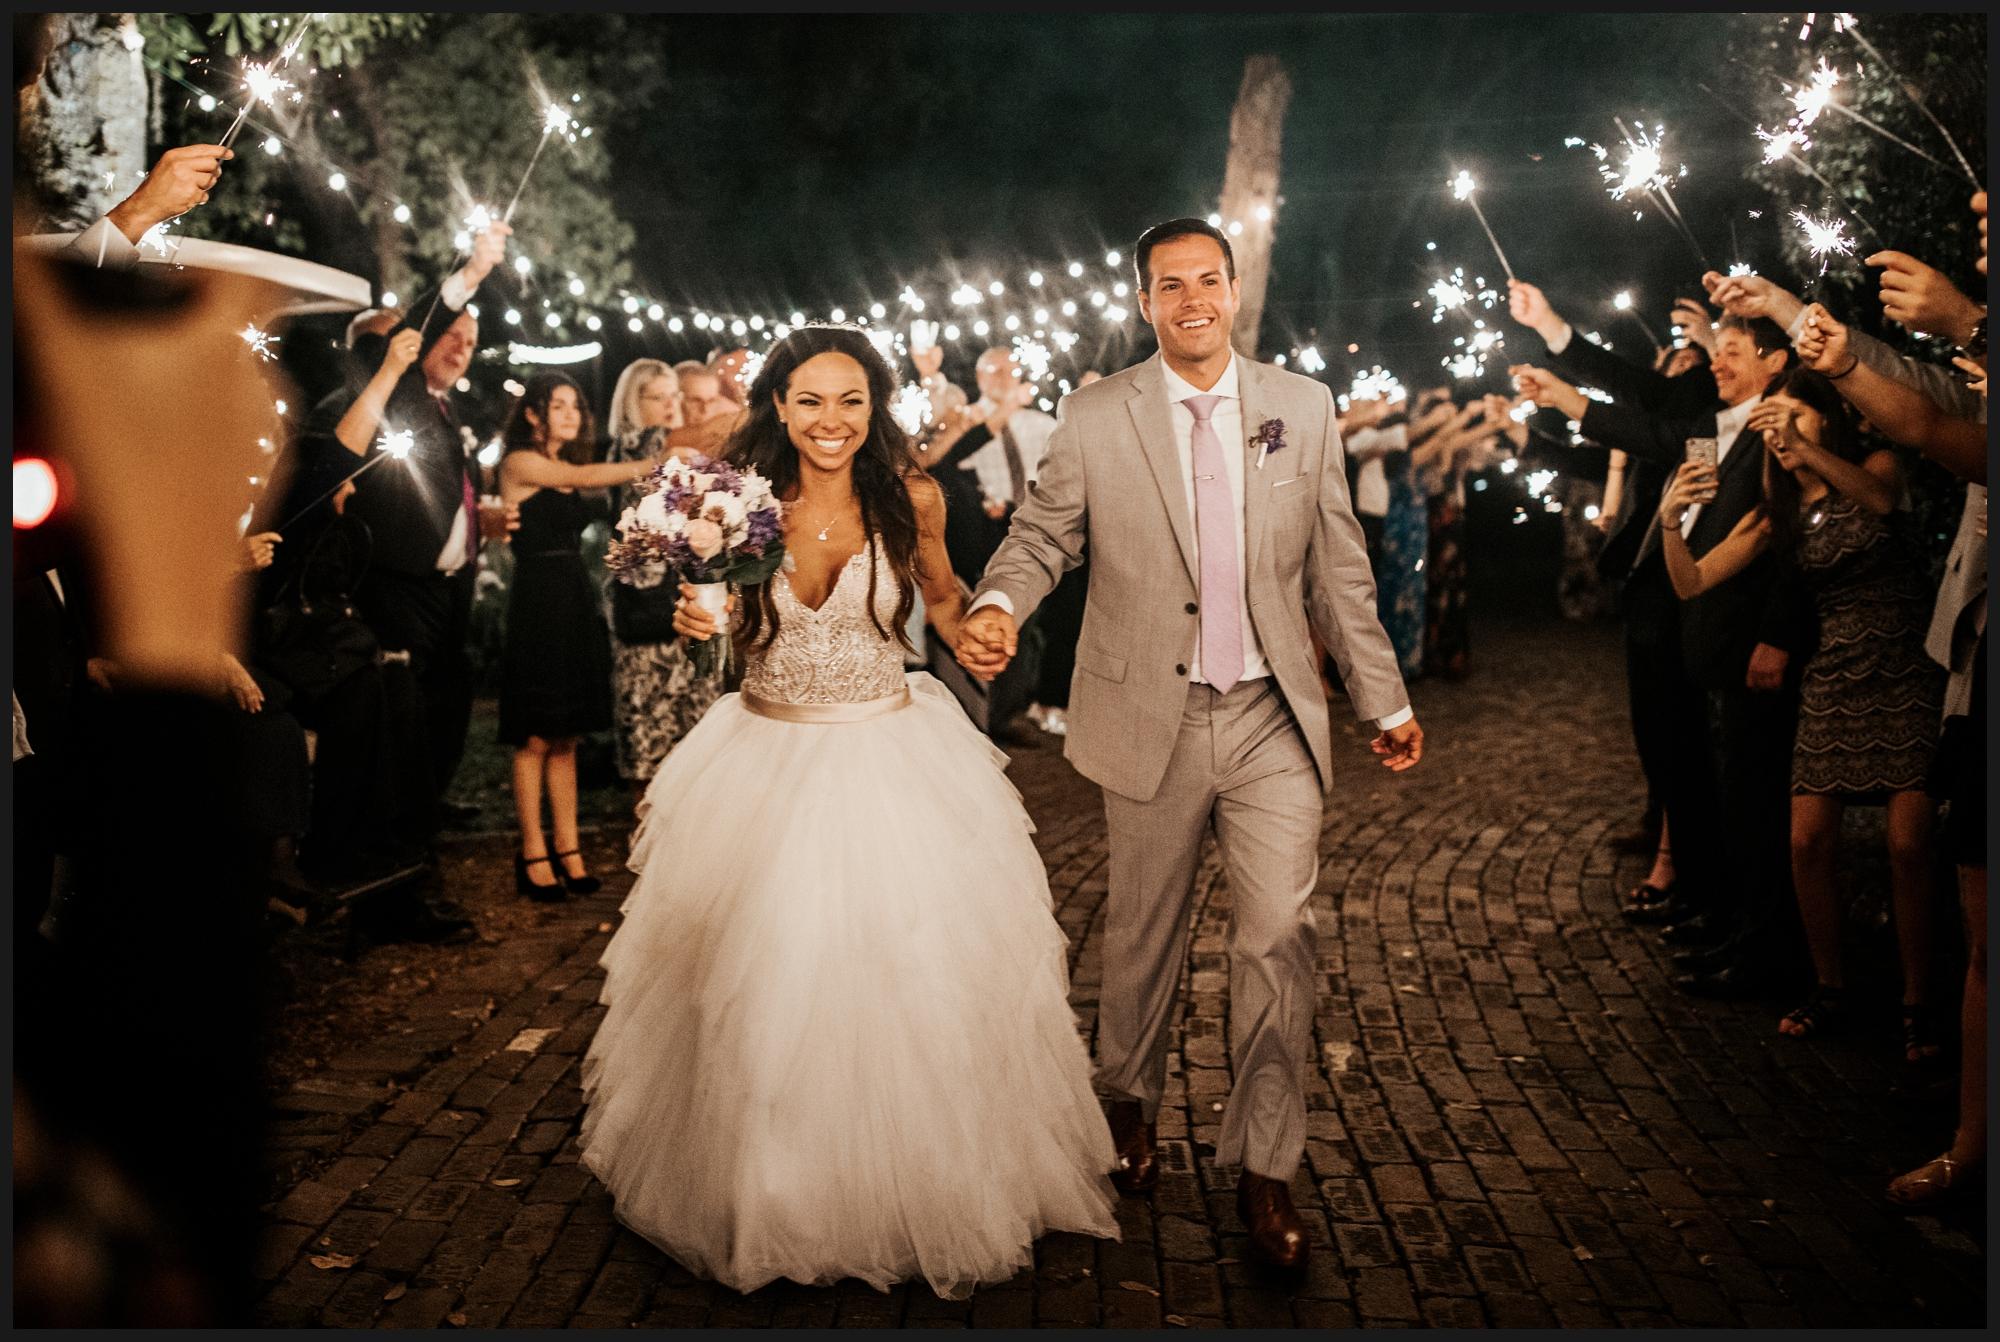 Orlando-Wedding-Photographer-destination-wedding-photographer-florida-wedding-photographer-bohemian-wedding-photographer_1651.jpg